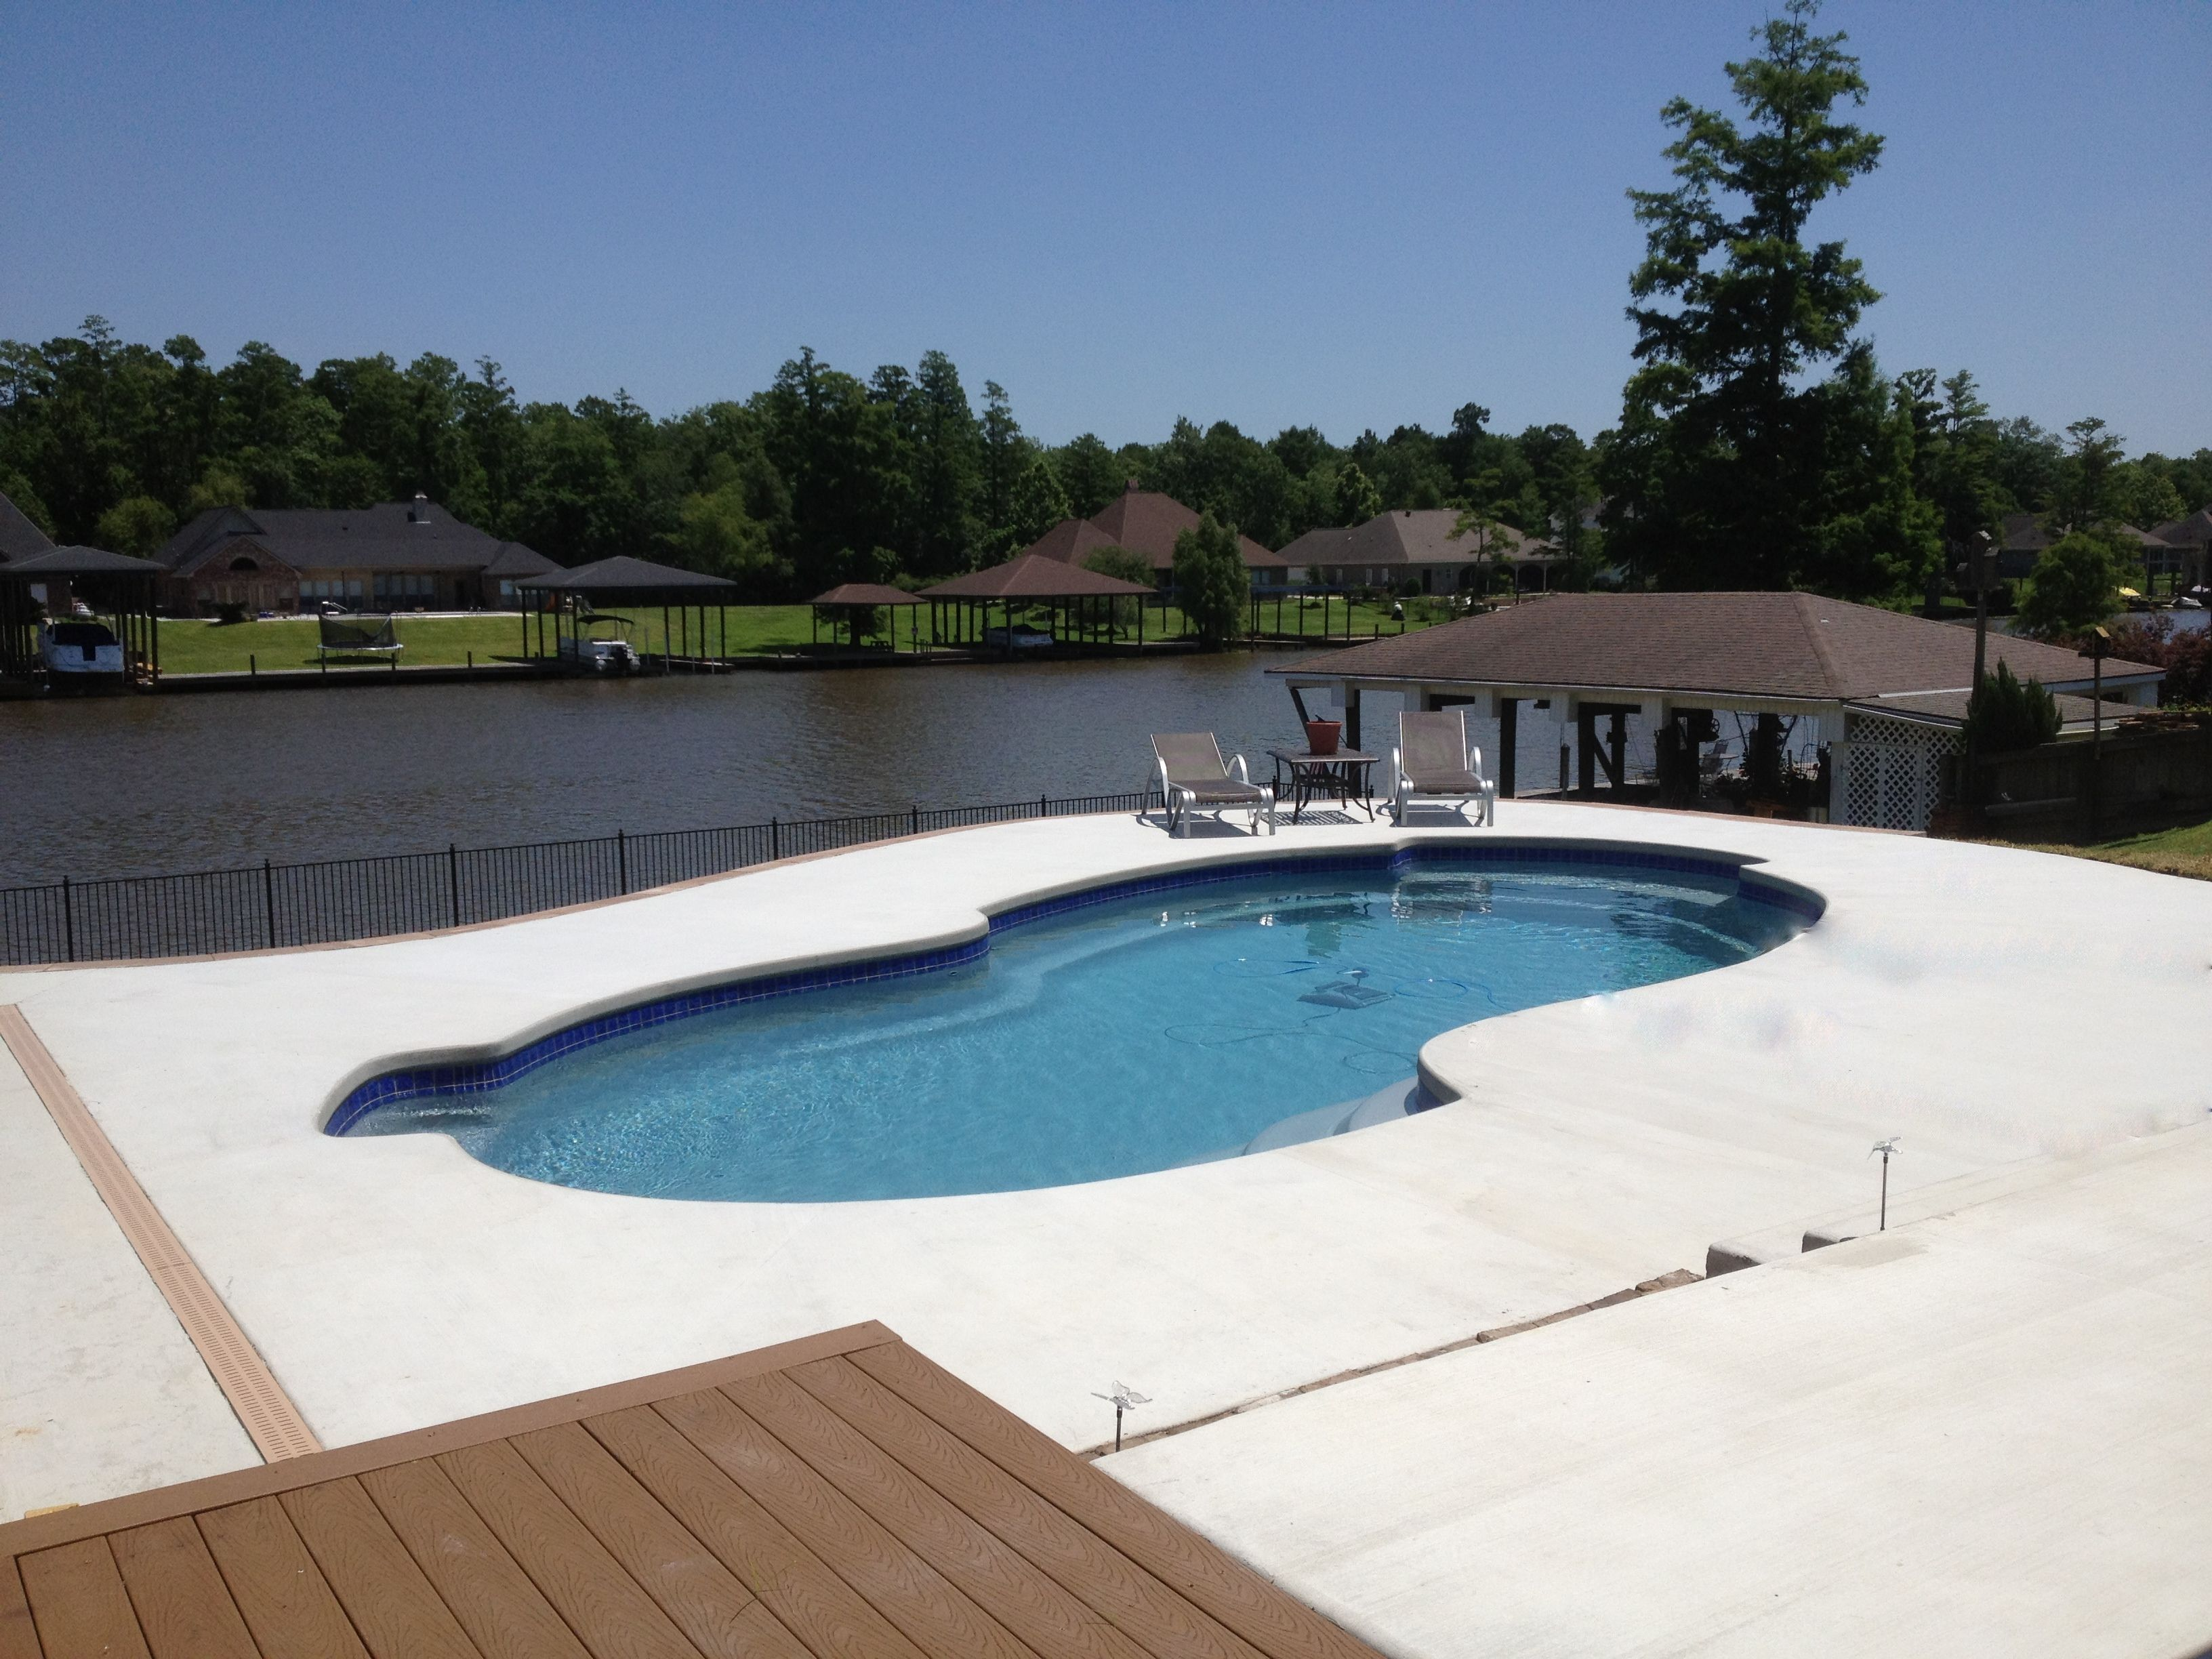 Central Pools Baton Rouge Fiberglass Pools Pool Swimming Pools Fiberglass Pools